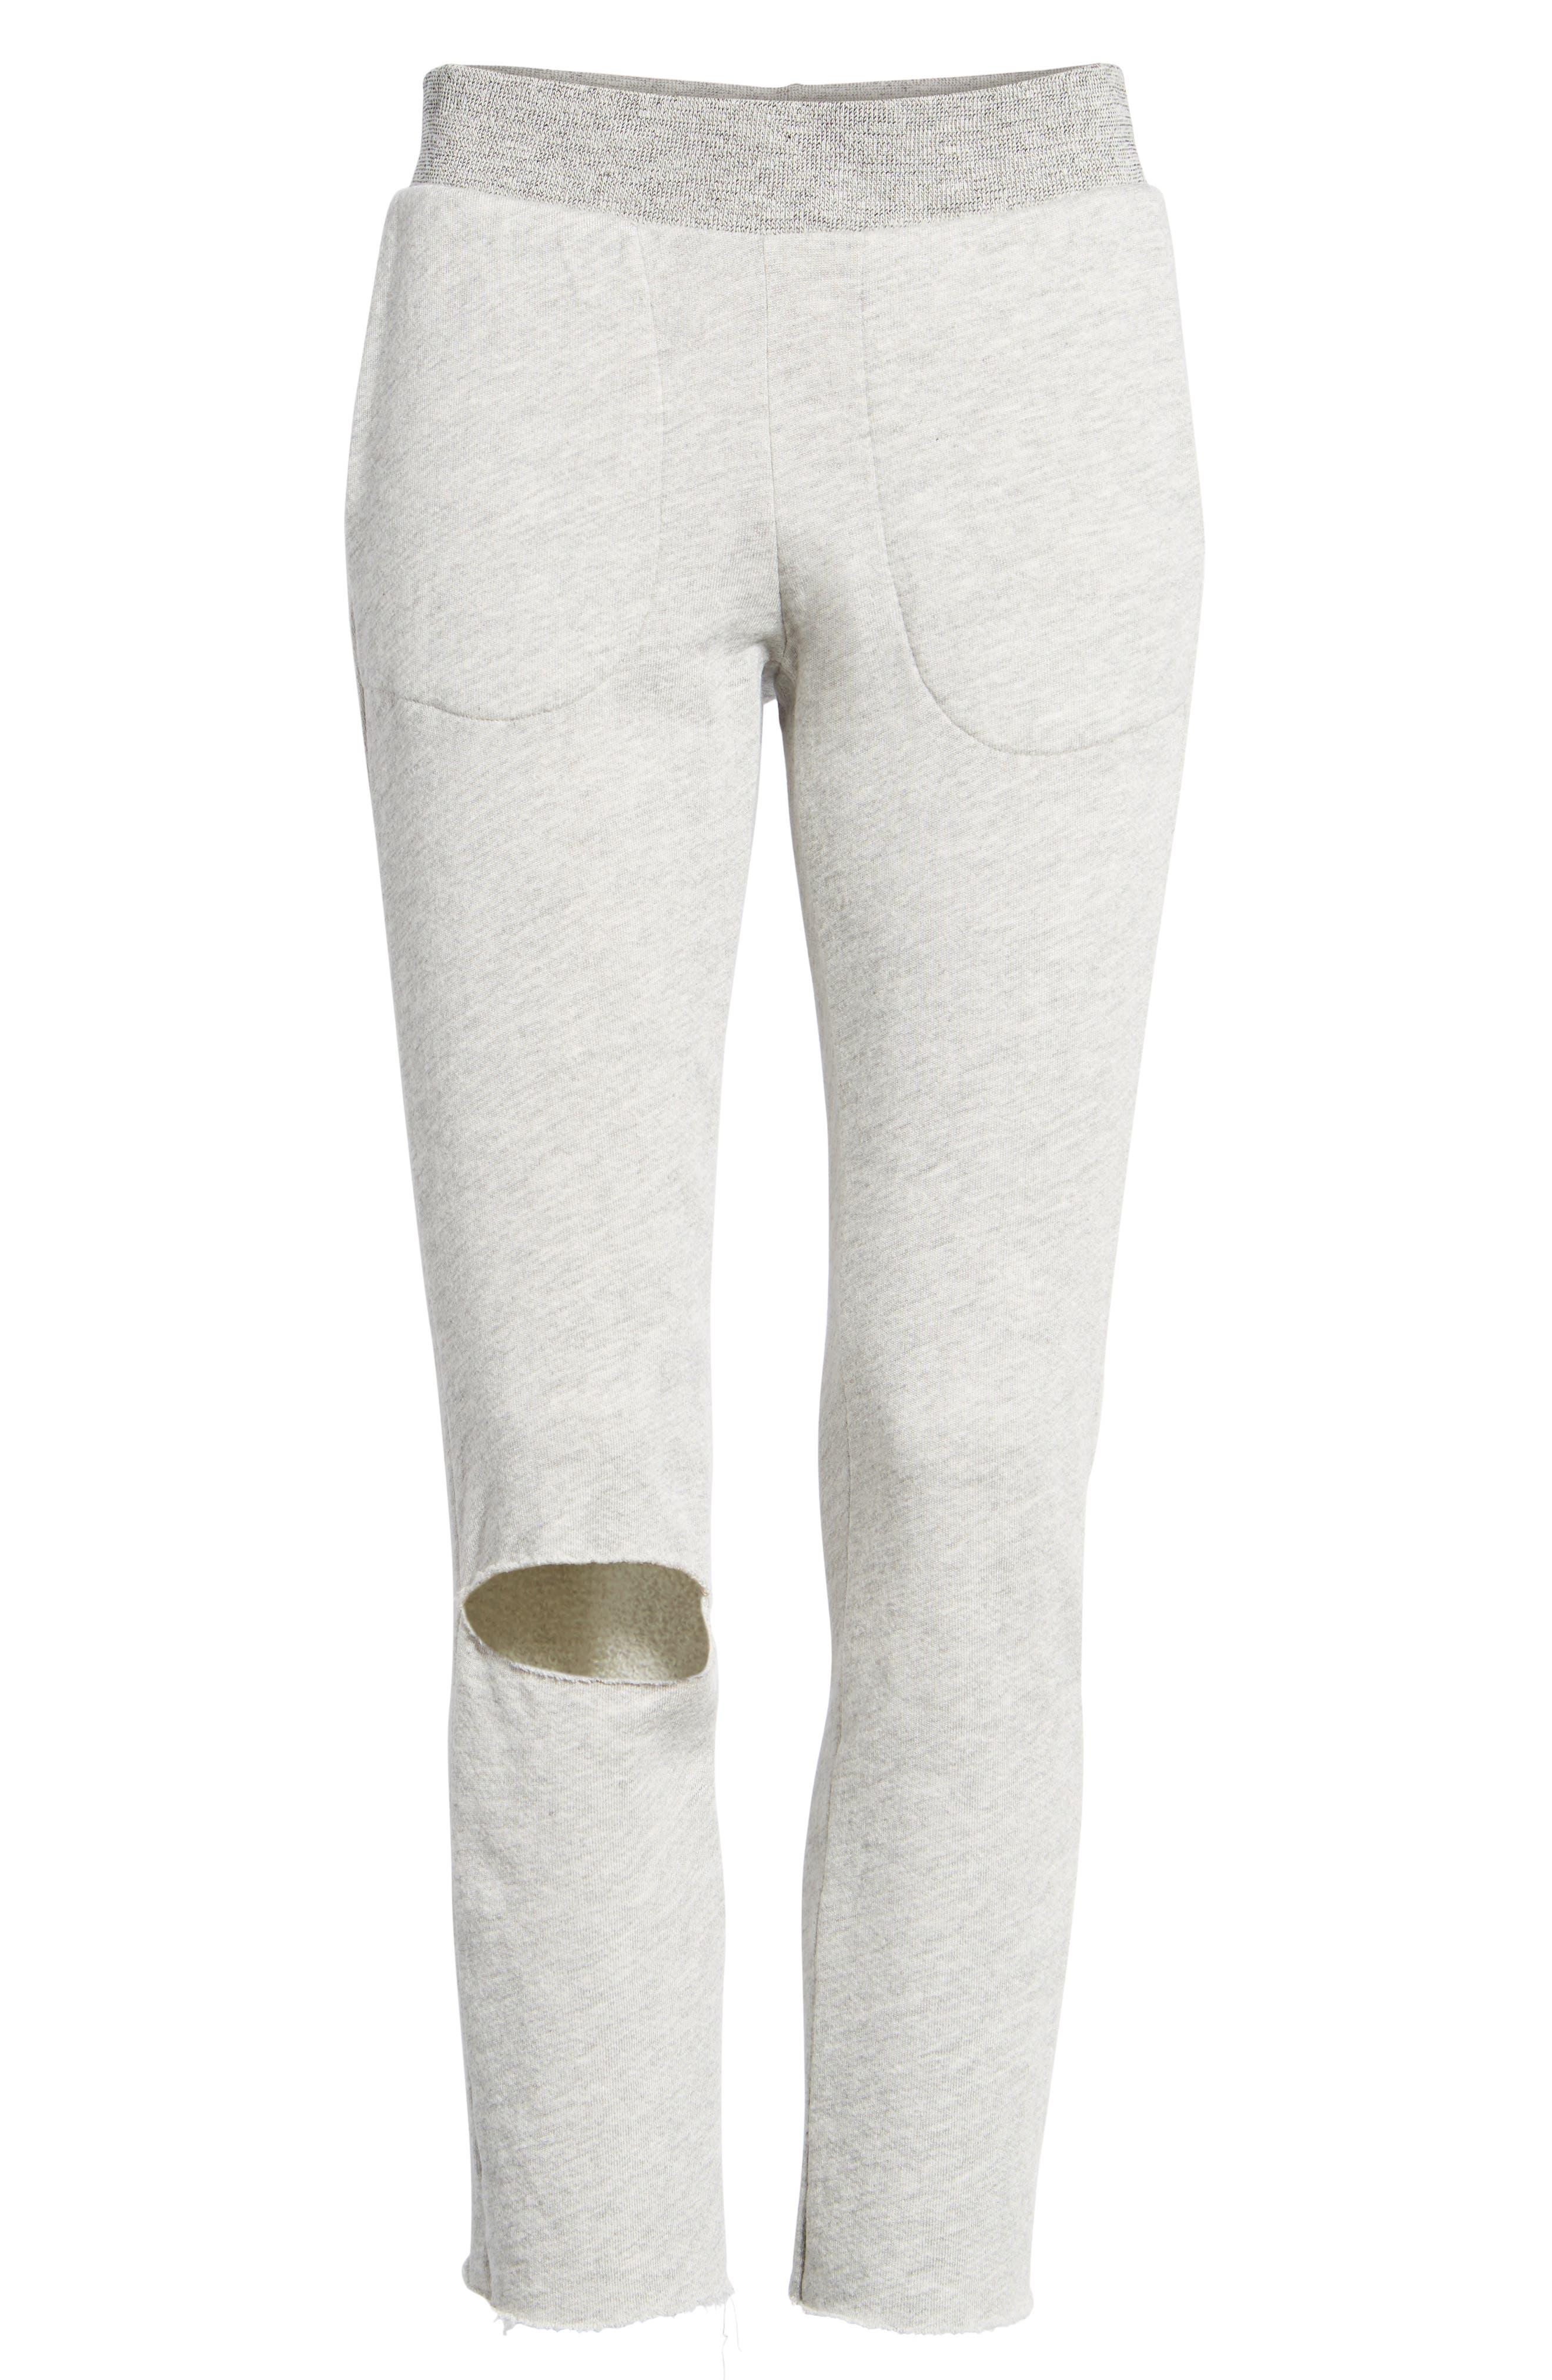 Malibu Slit Knee Sweatpants,                             Alternate thumbnail 6, color,                             030